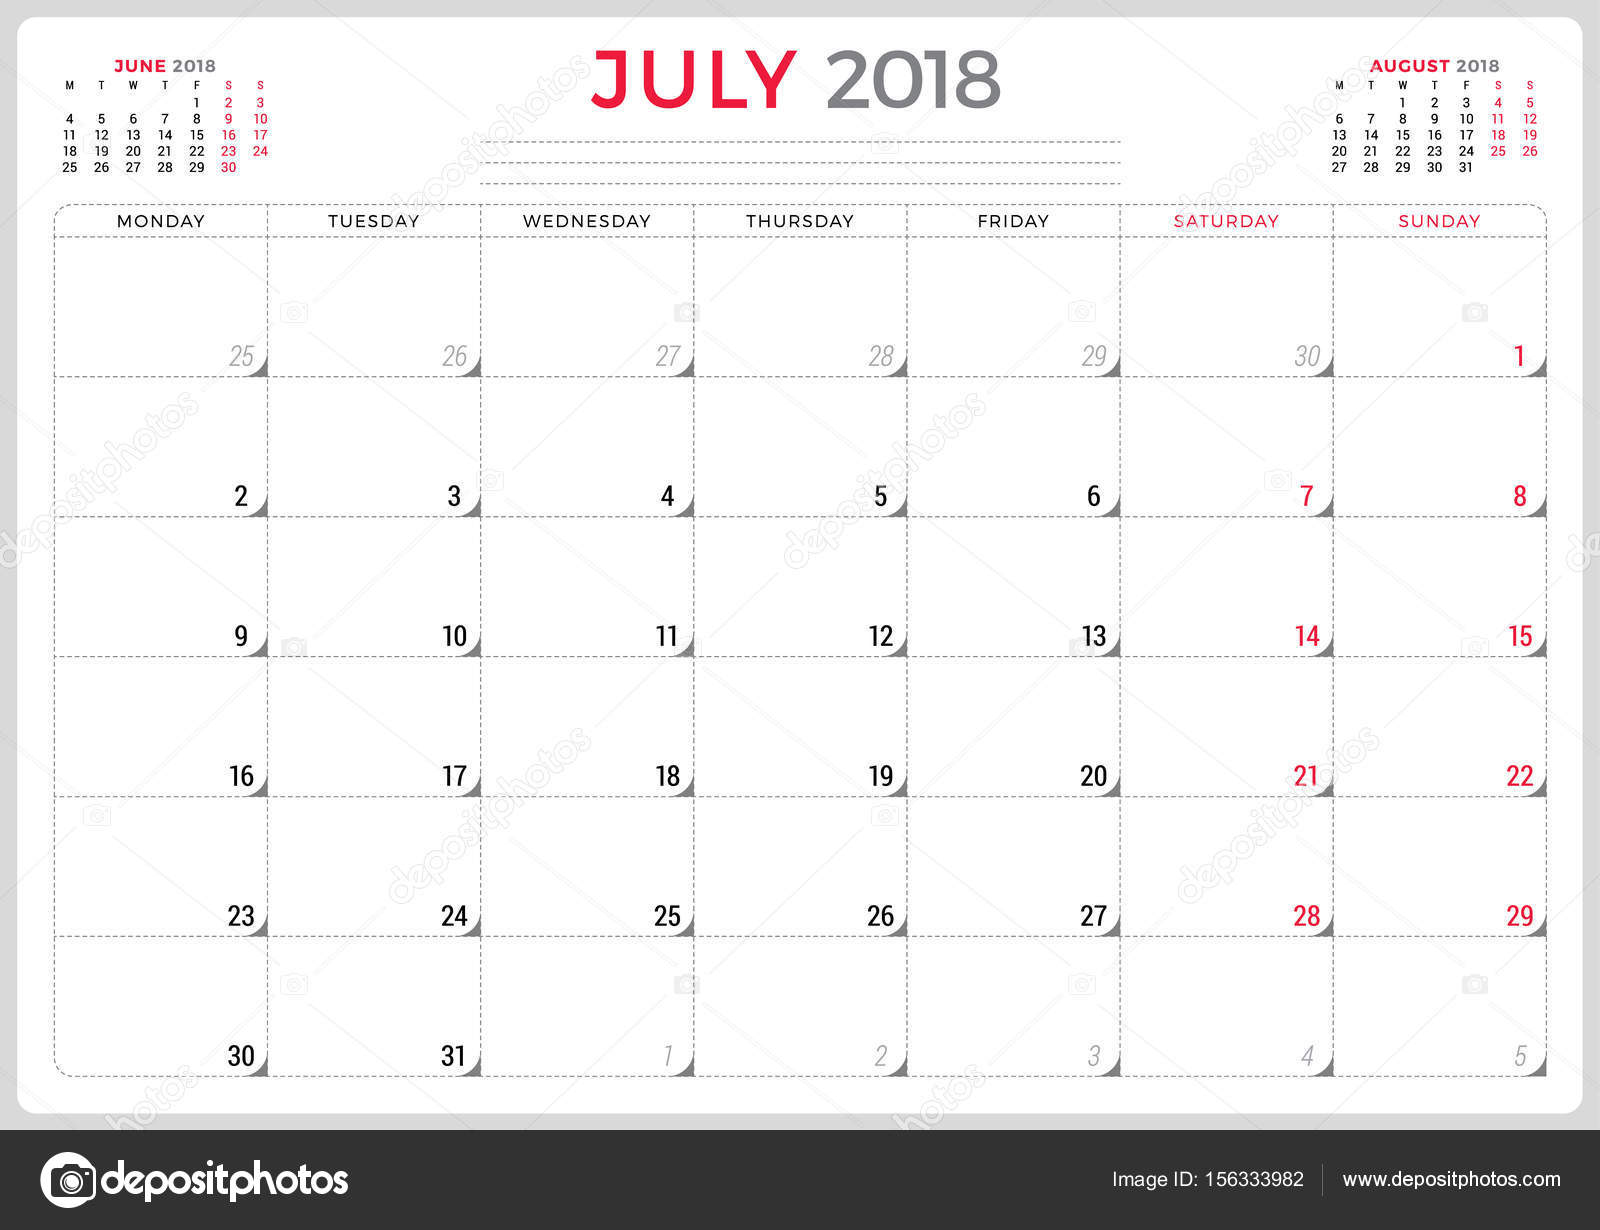 july 2018 calendar planner design template week starts on monday stationery design